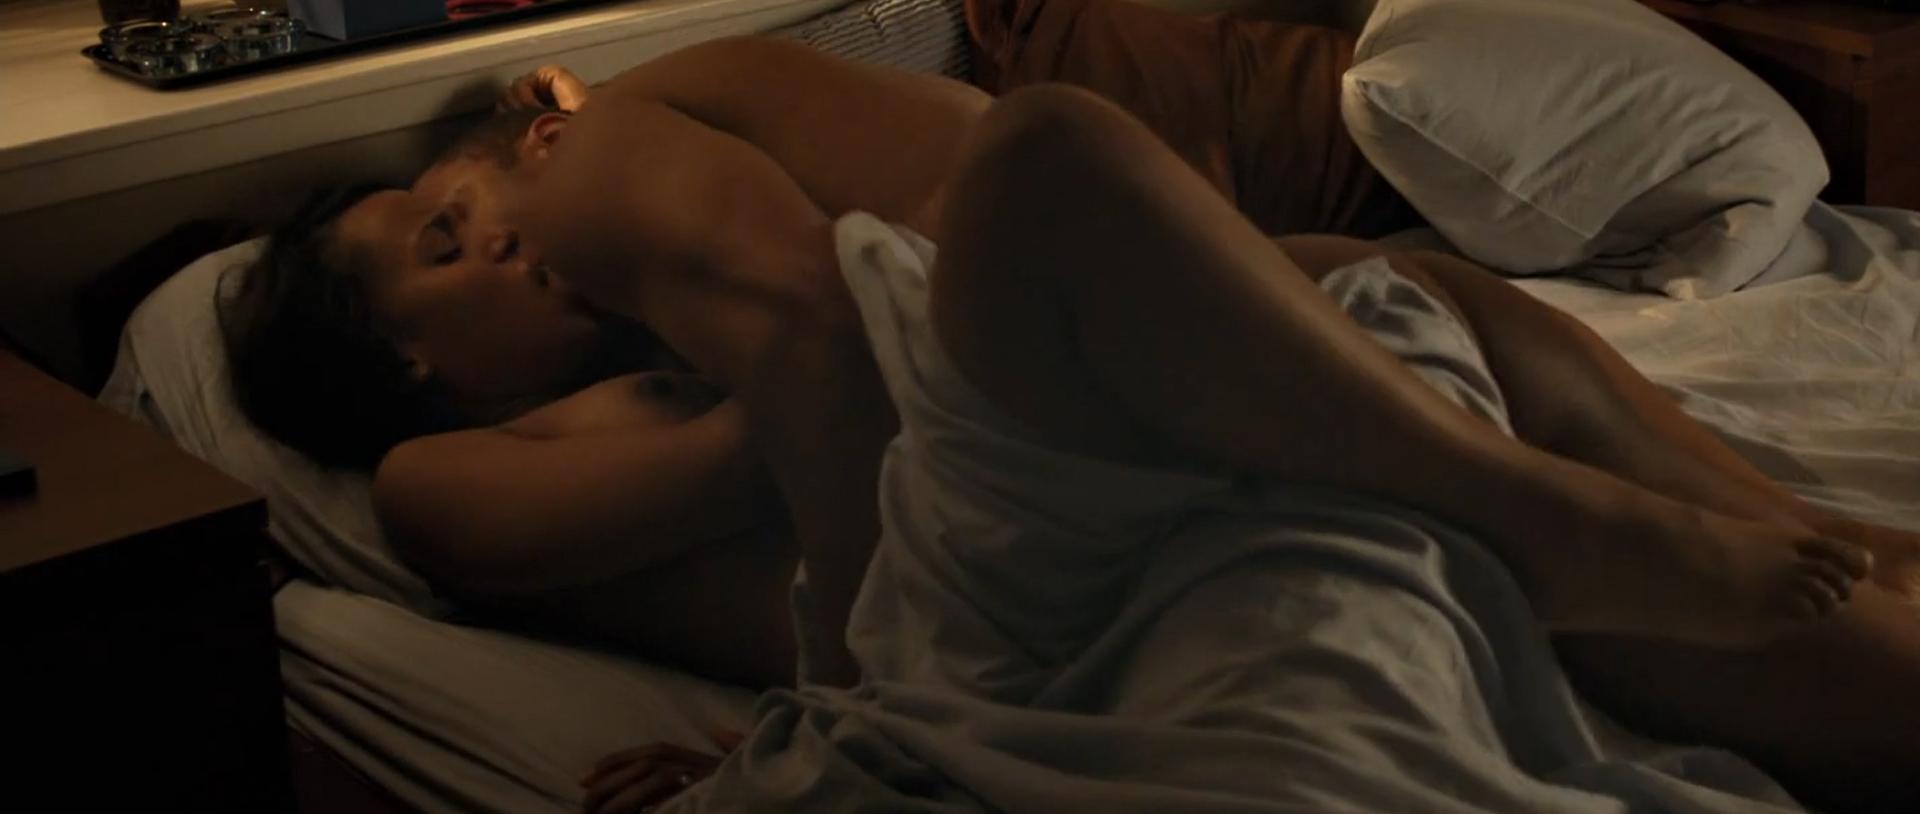 Kerry washington naked sex scene video